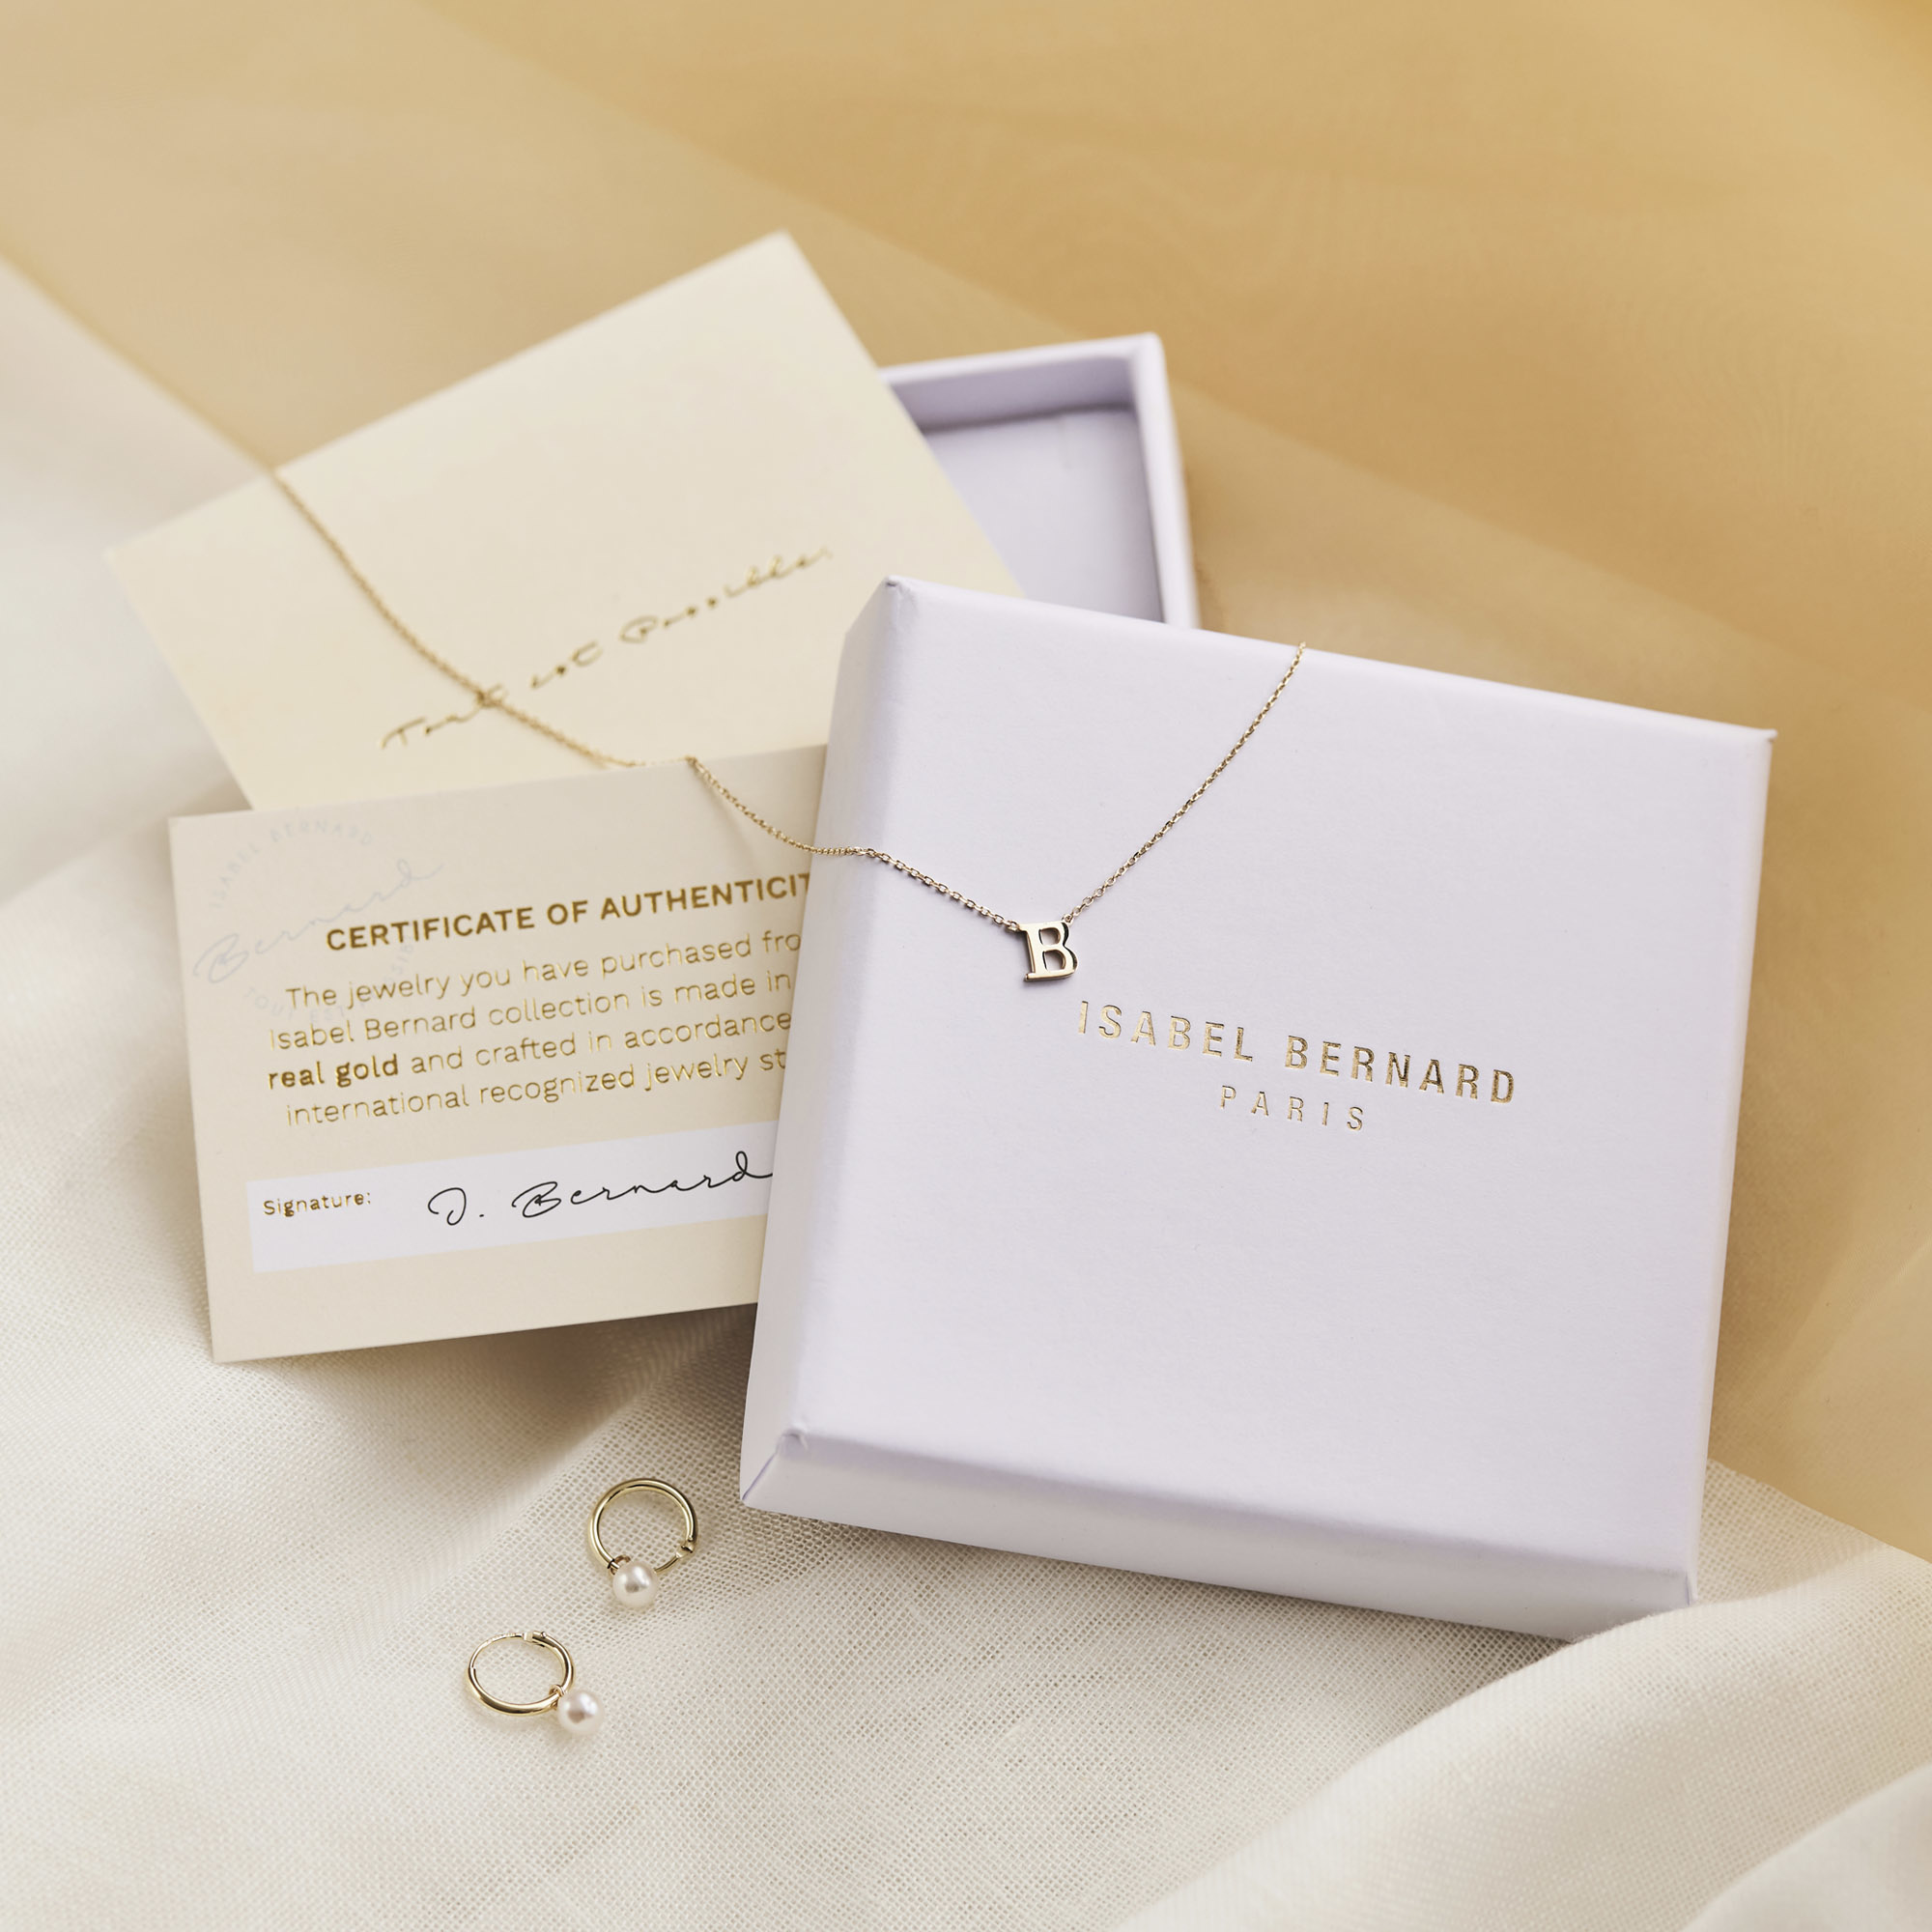 Isabel Bernard Saint Germain de Rennes 14 karat white gold ring with zirconia